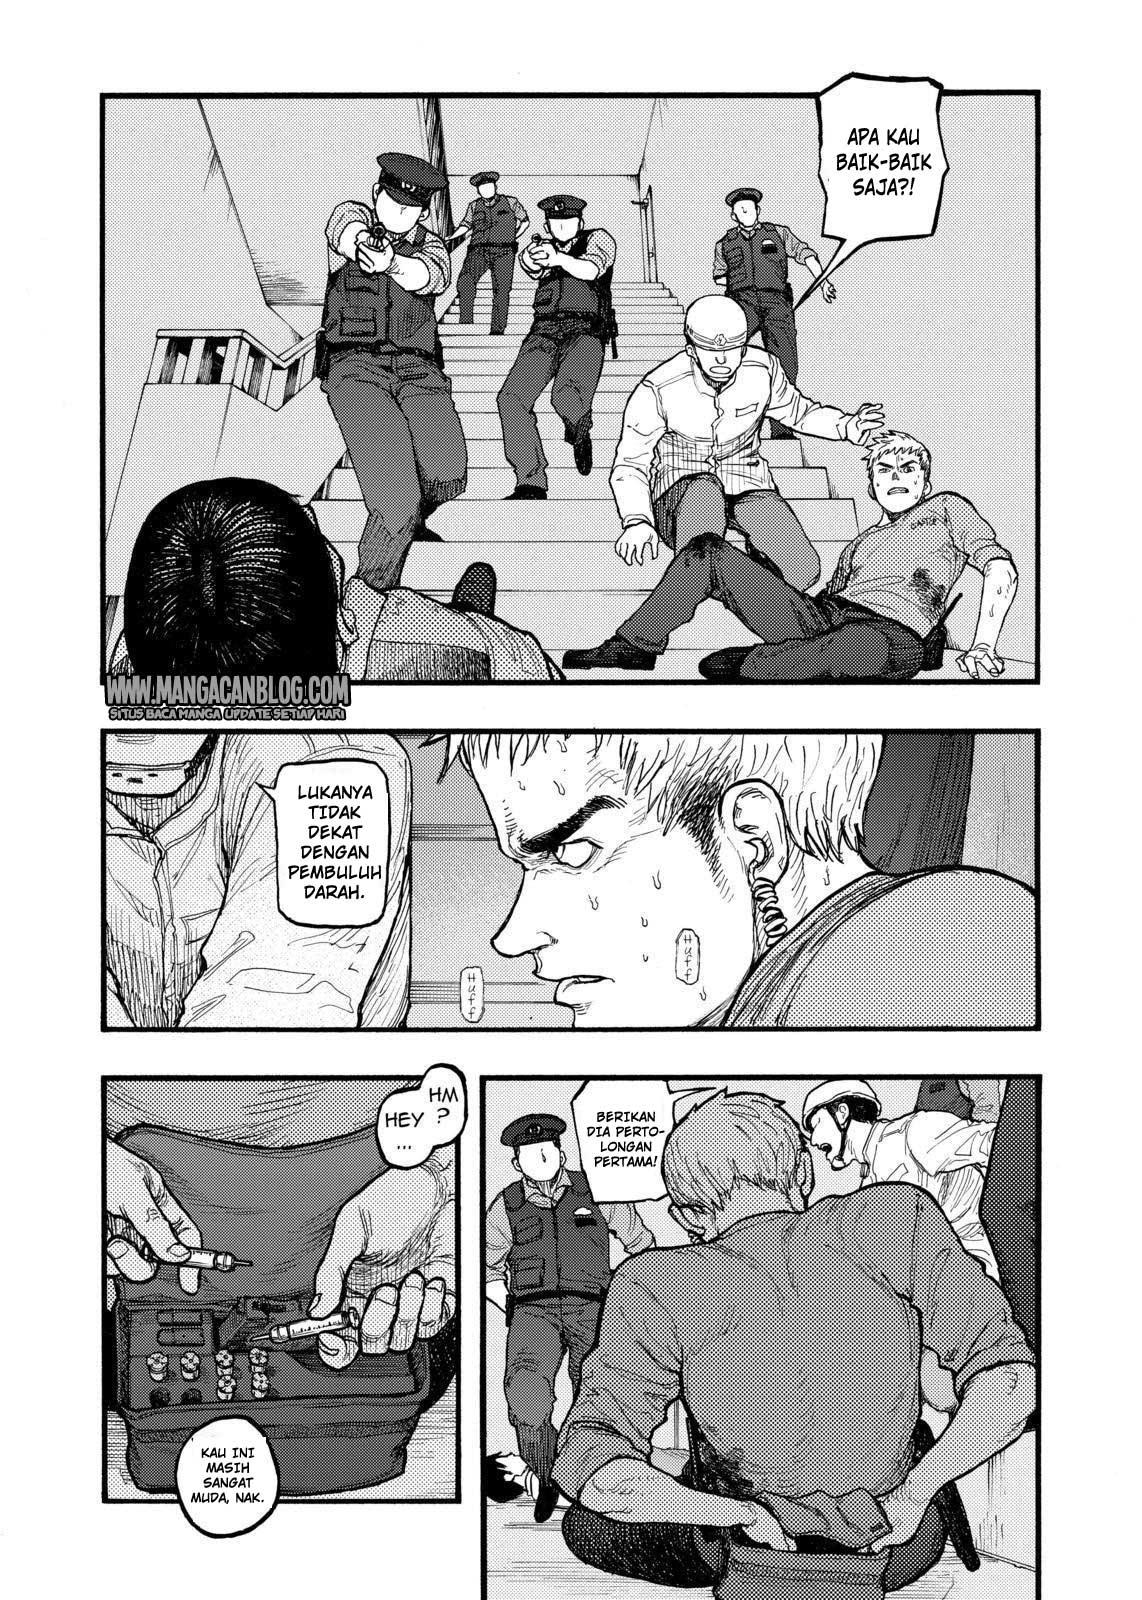 Dilarang COPAS - situs resmi www.mangacanblog.com - Komik ajin 039 - garis keras medan pertempuran 2 40 Indonesia ajin 039 - garis keras medan pertempuran 2 Terbaru 22|Baca Manga Komik Indonesia|Mangacan